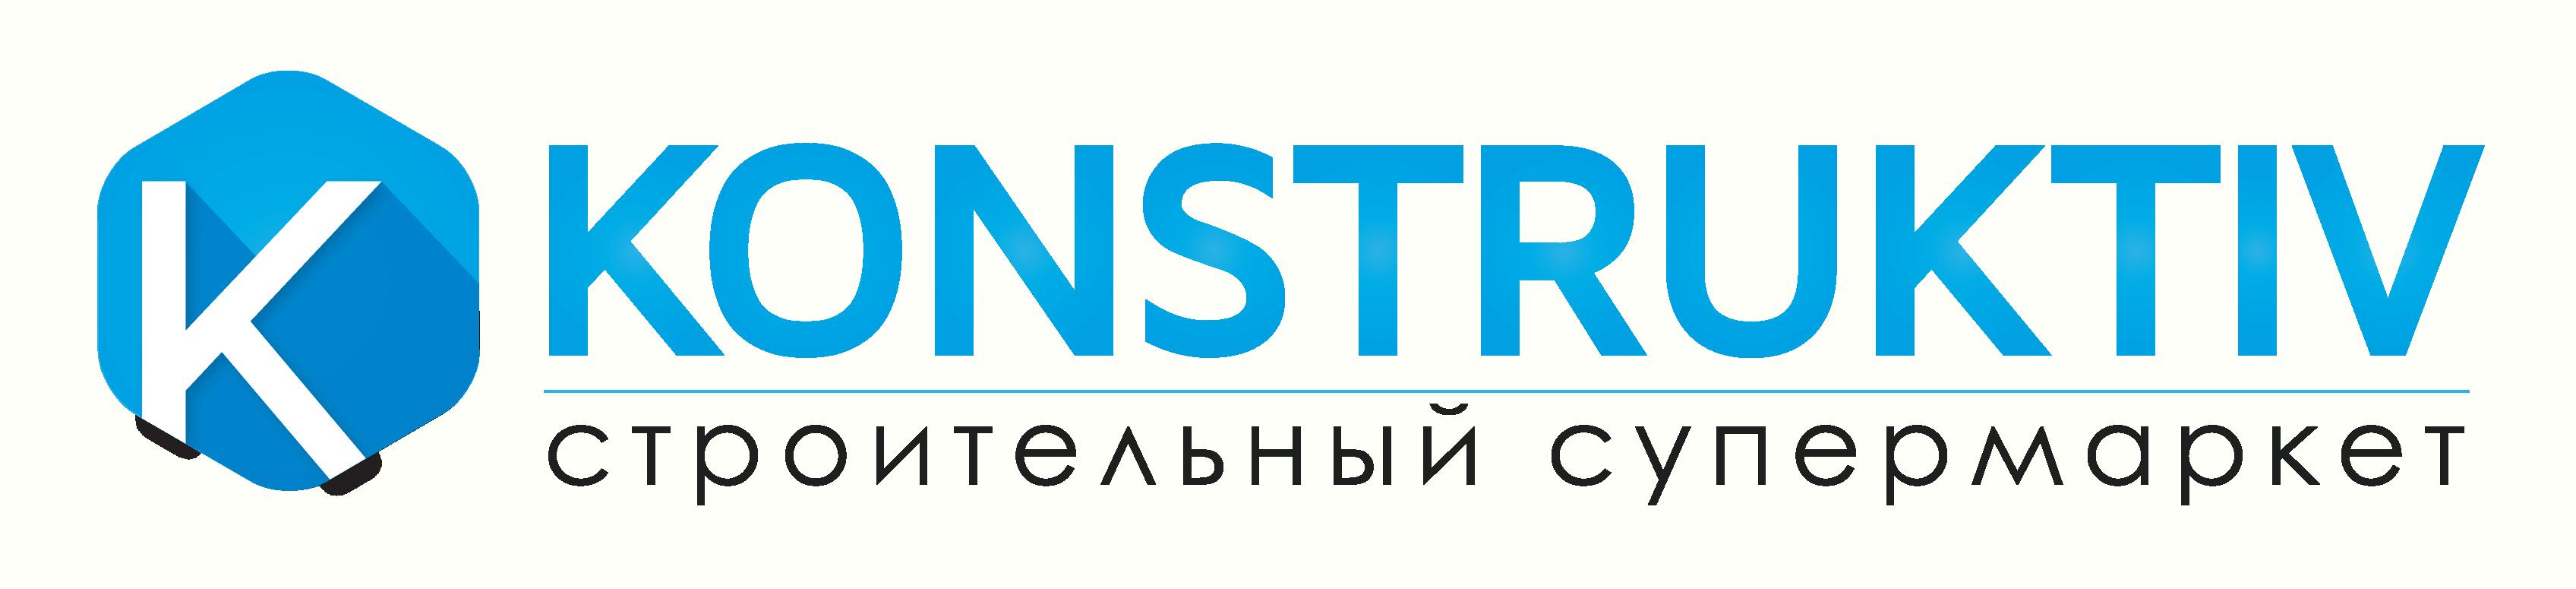 ООО «Конструктив ВТВ»